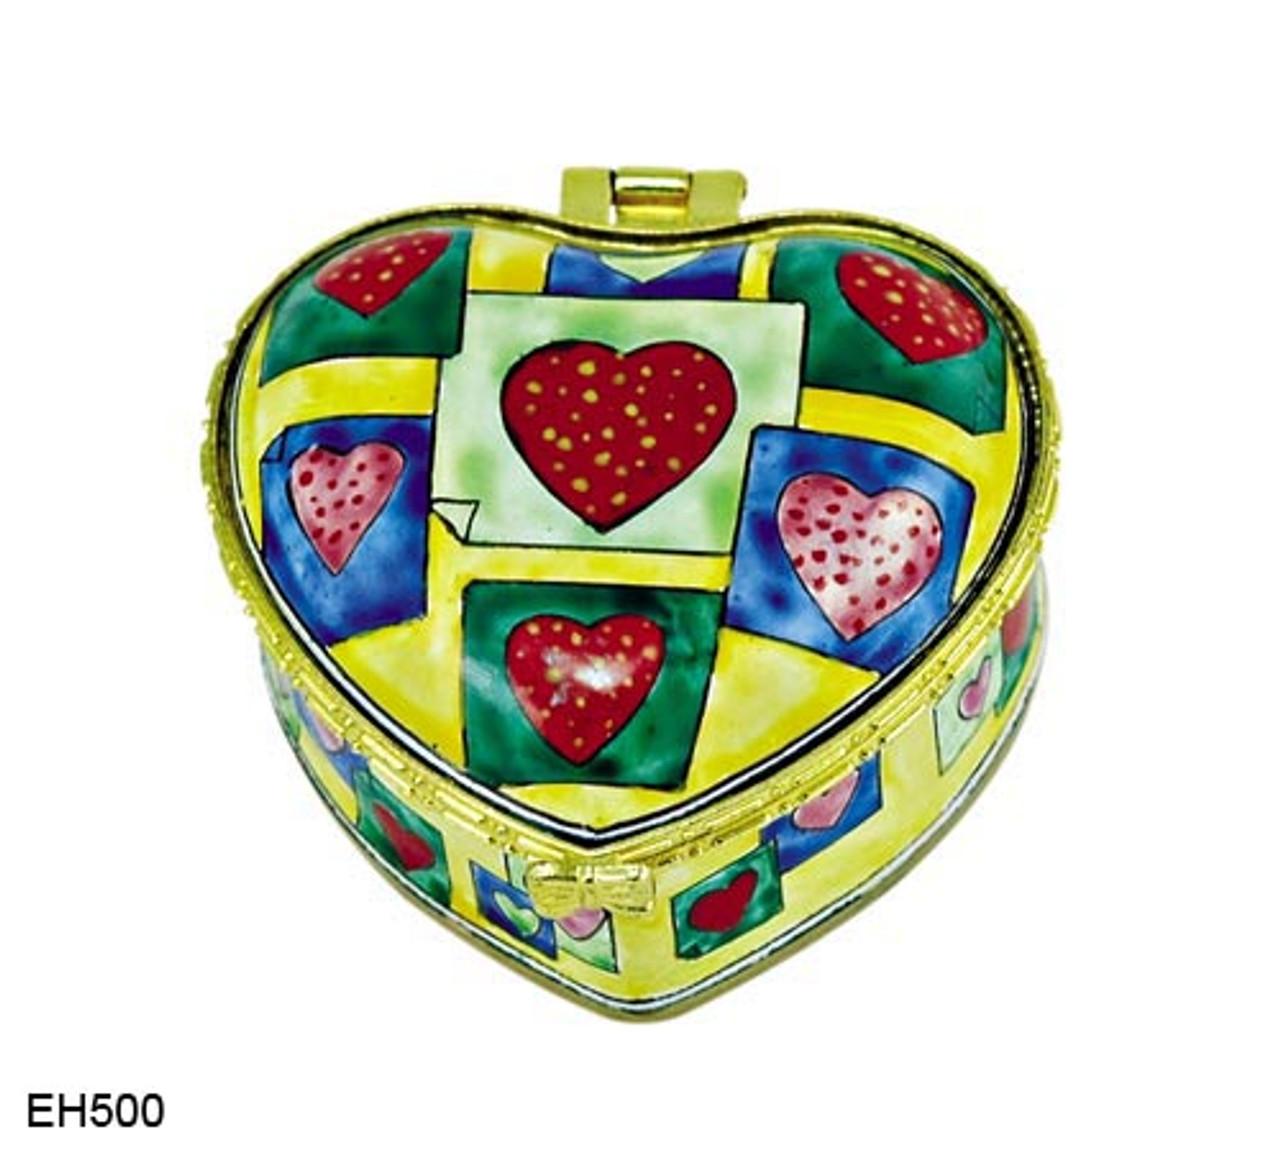 EH500 Kelvin Chen Hearts Pattern Enamel Hinged Box